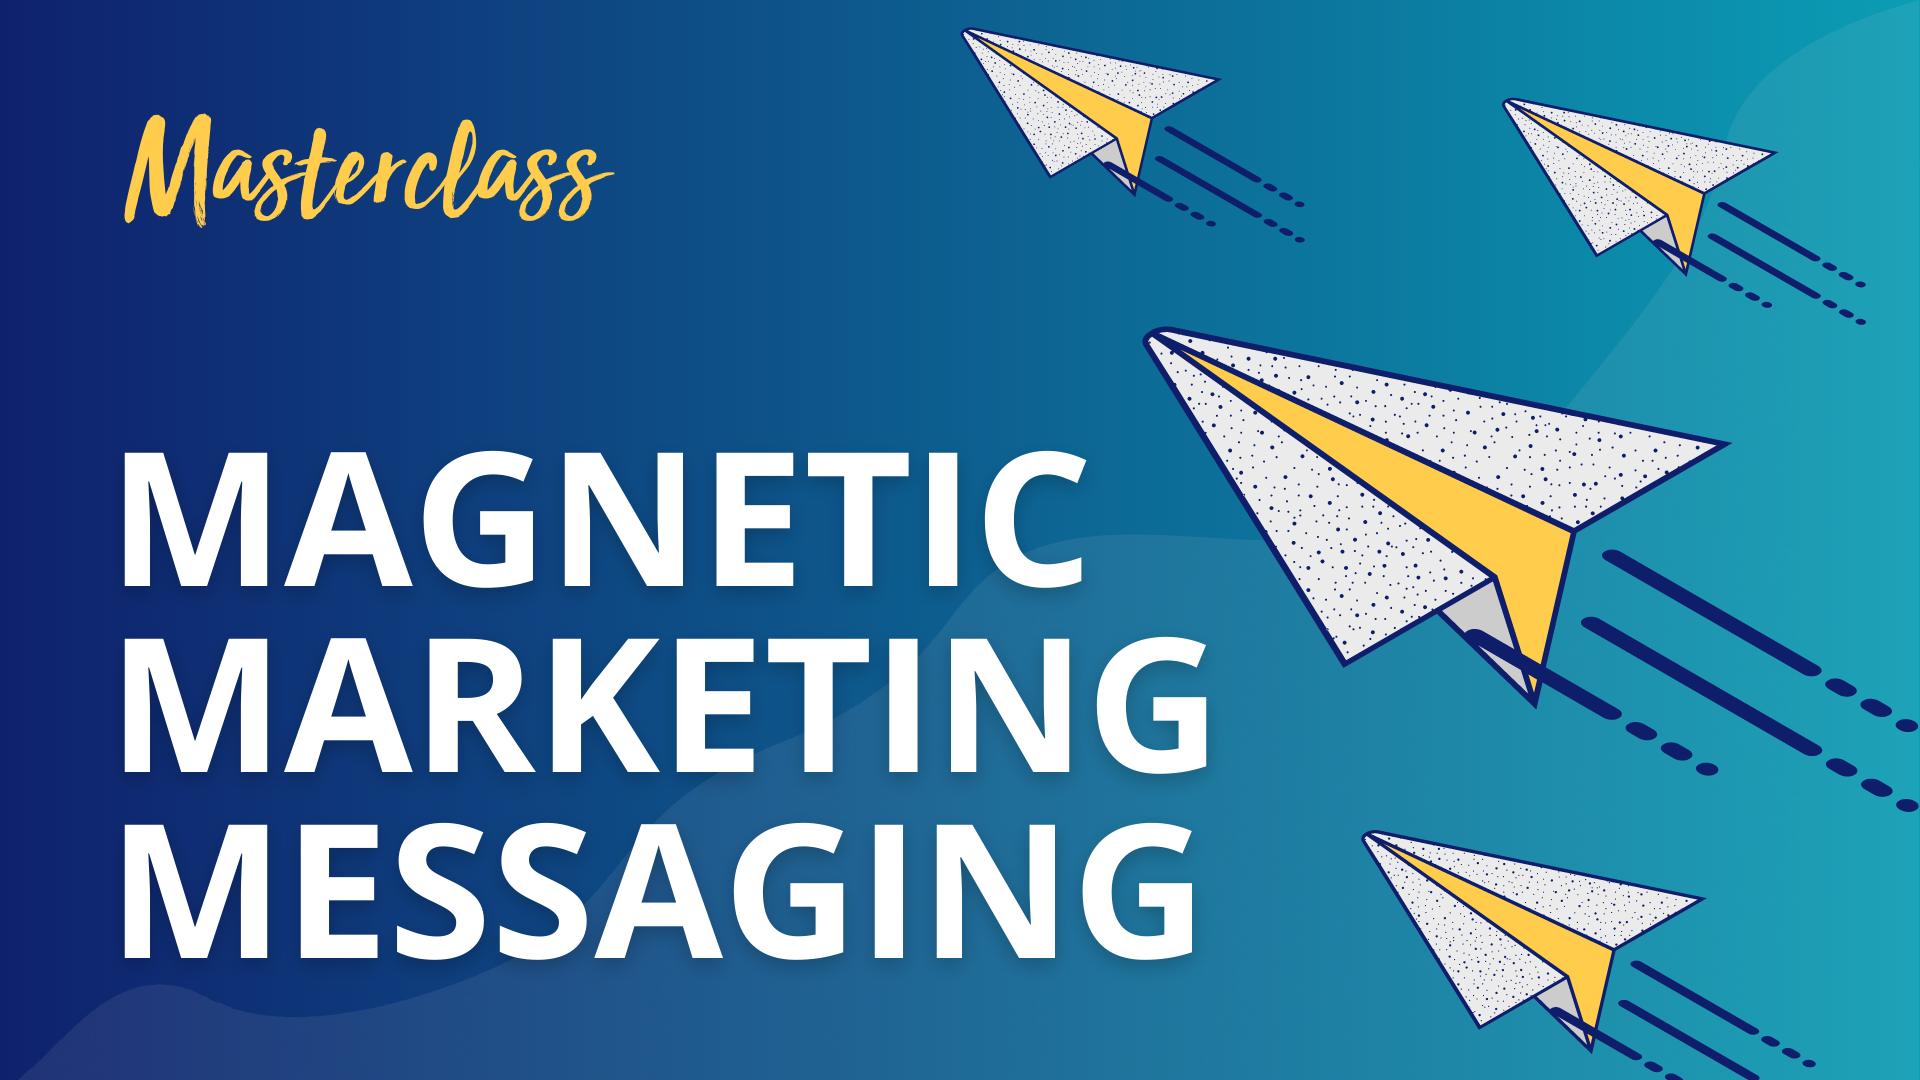 Magnetic Marketing Messaging masterclass by Jessica Osborn